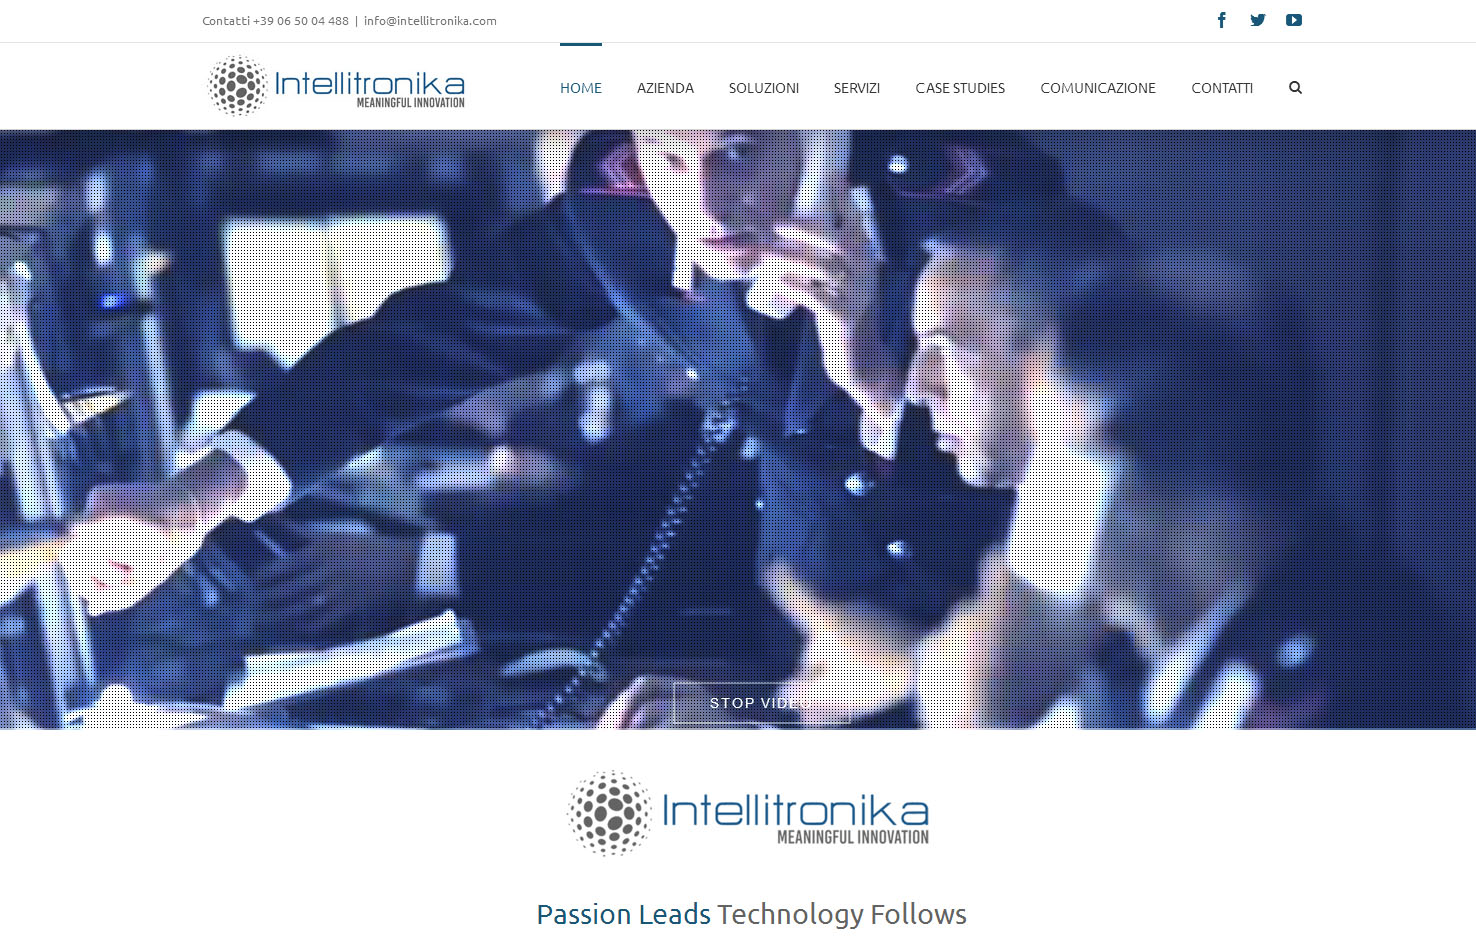 Intellitronika Sito Web 2016